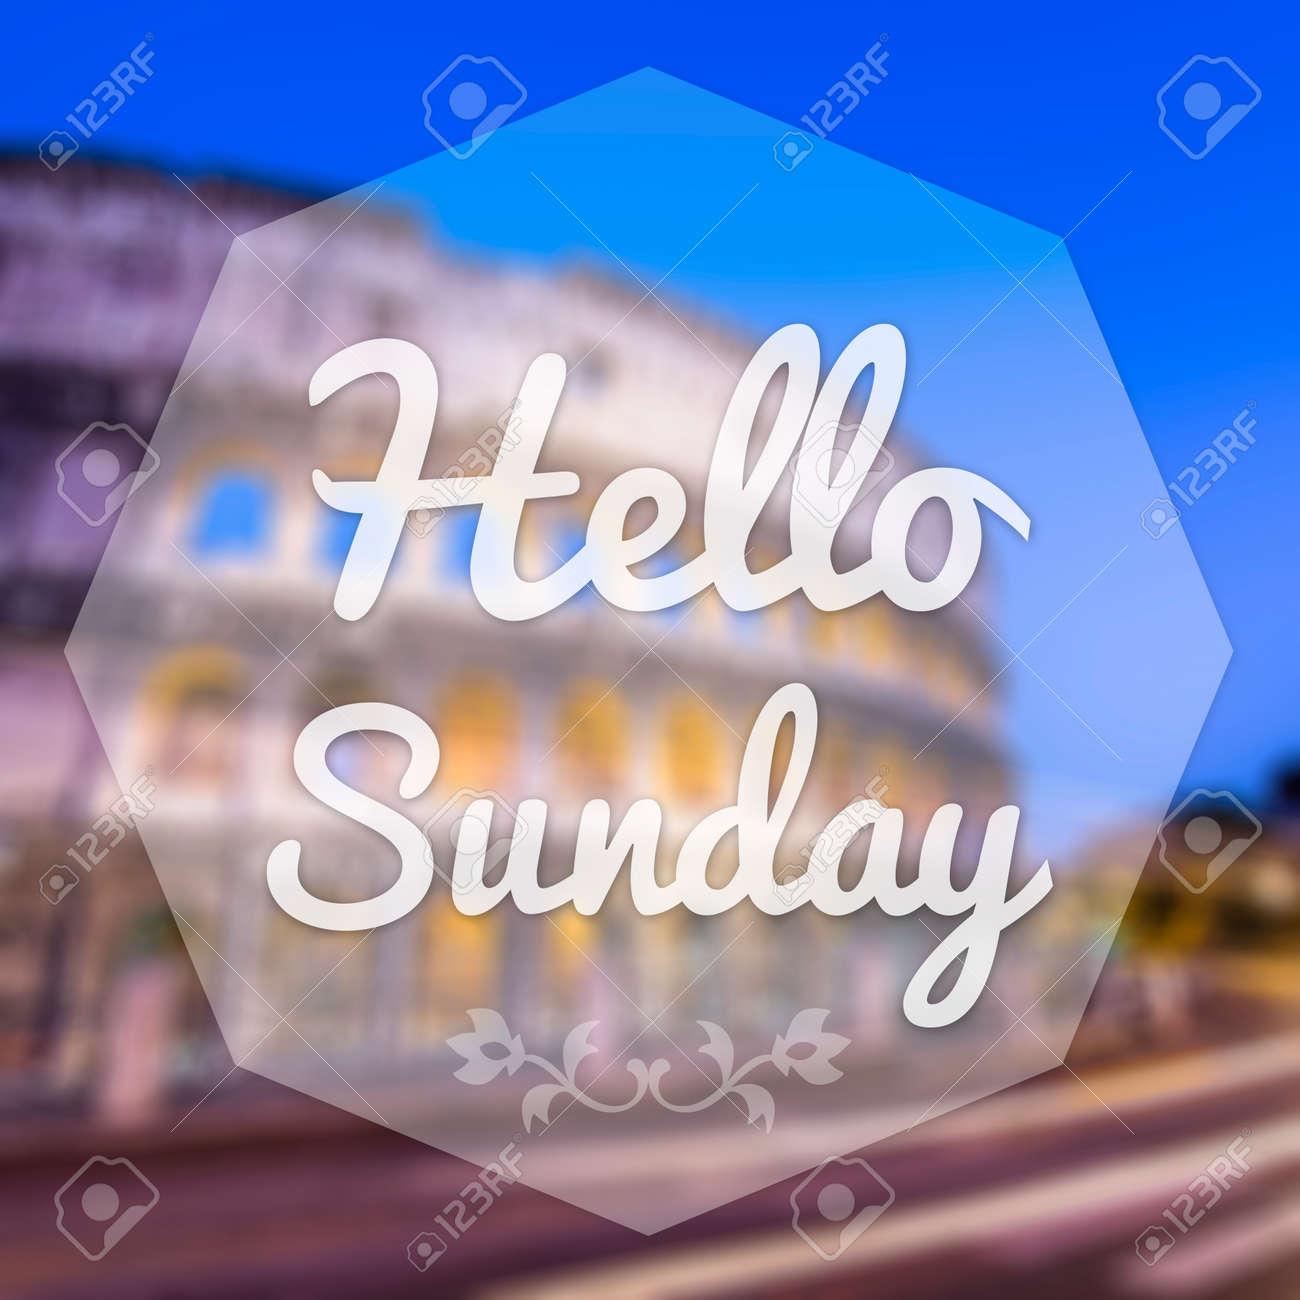 Good Morning Sunday On Blur Background Greeting Card Stock Photo